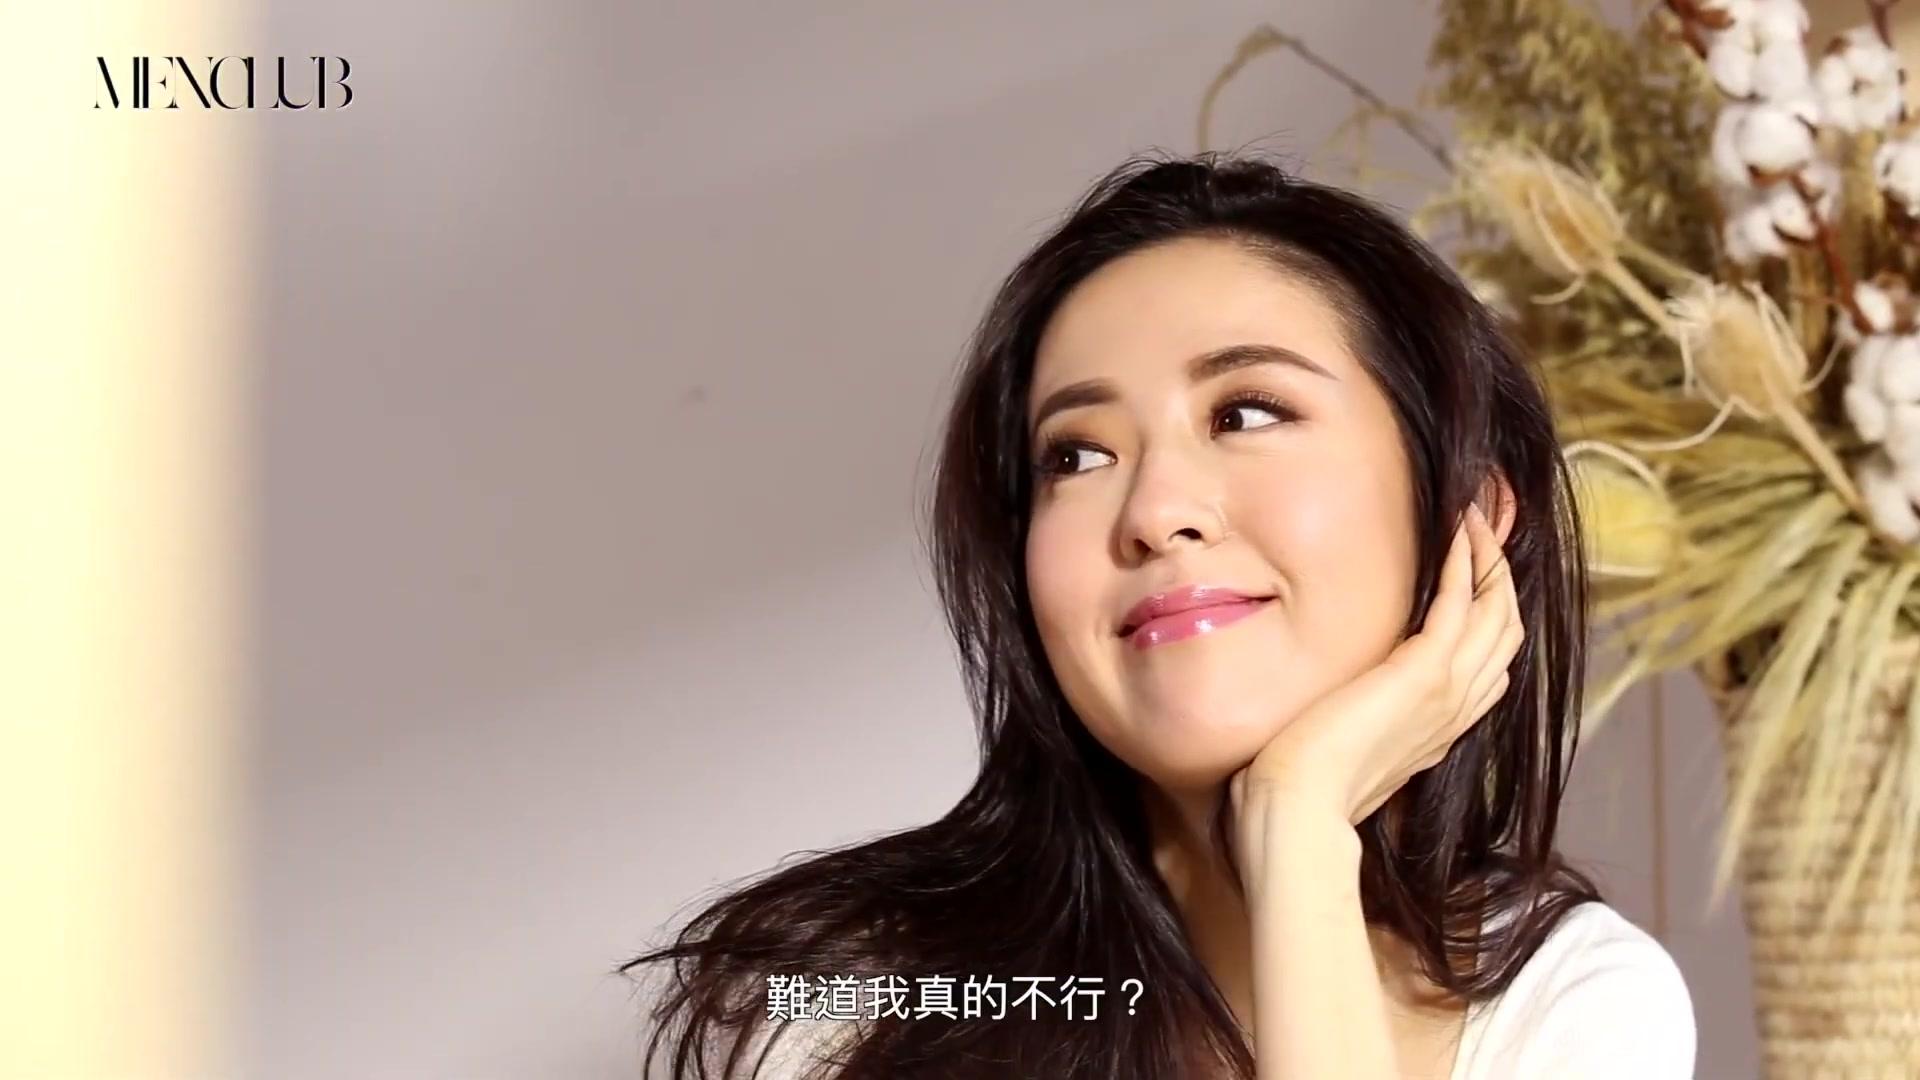 TVB女神【唐詩詠】_1080p_嗶哩嗶哩 (゜-゜)つロ 干杯~-bilibili